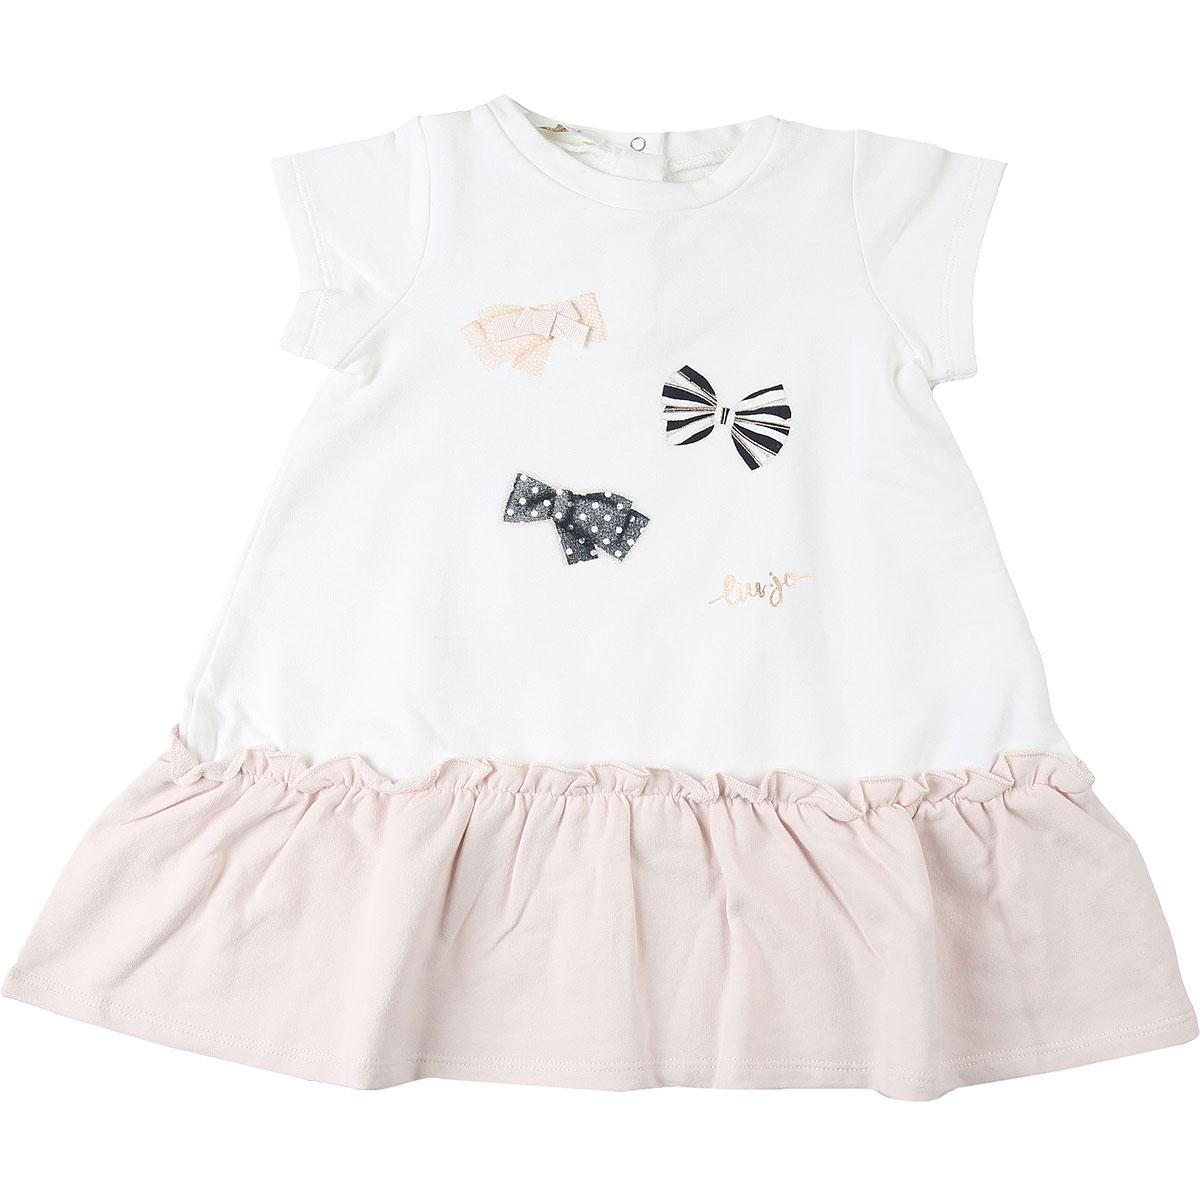 Liu Jo Baby Dress for Girls On Sale, White, Cotton, 2019, 12M 18M